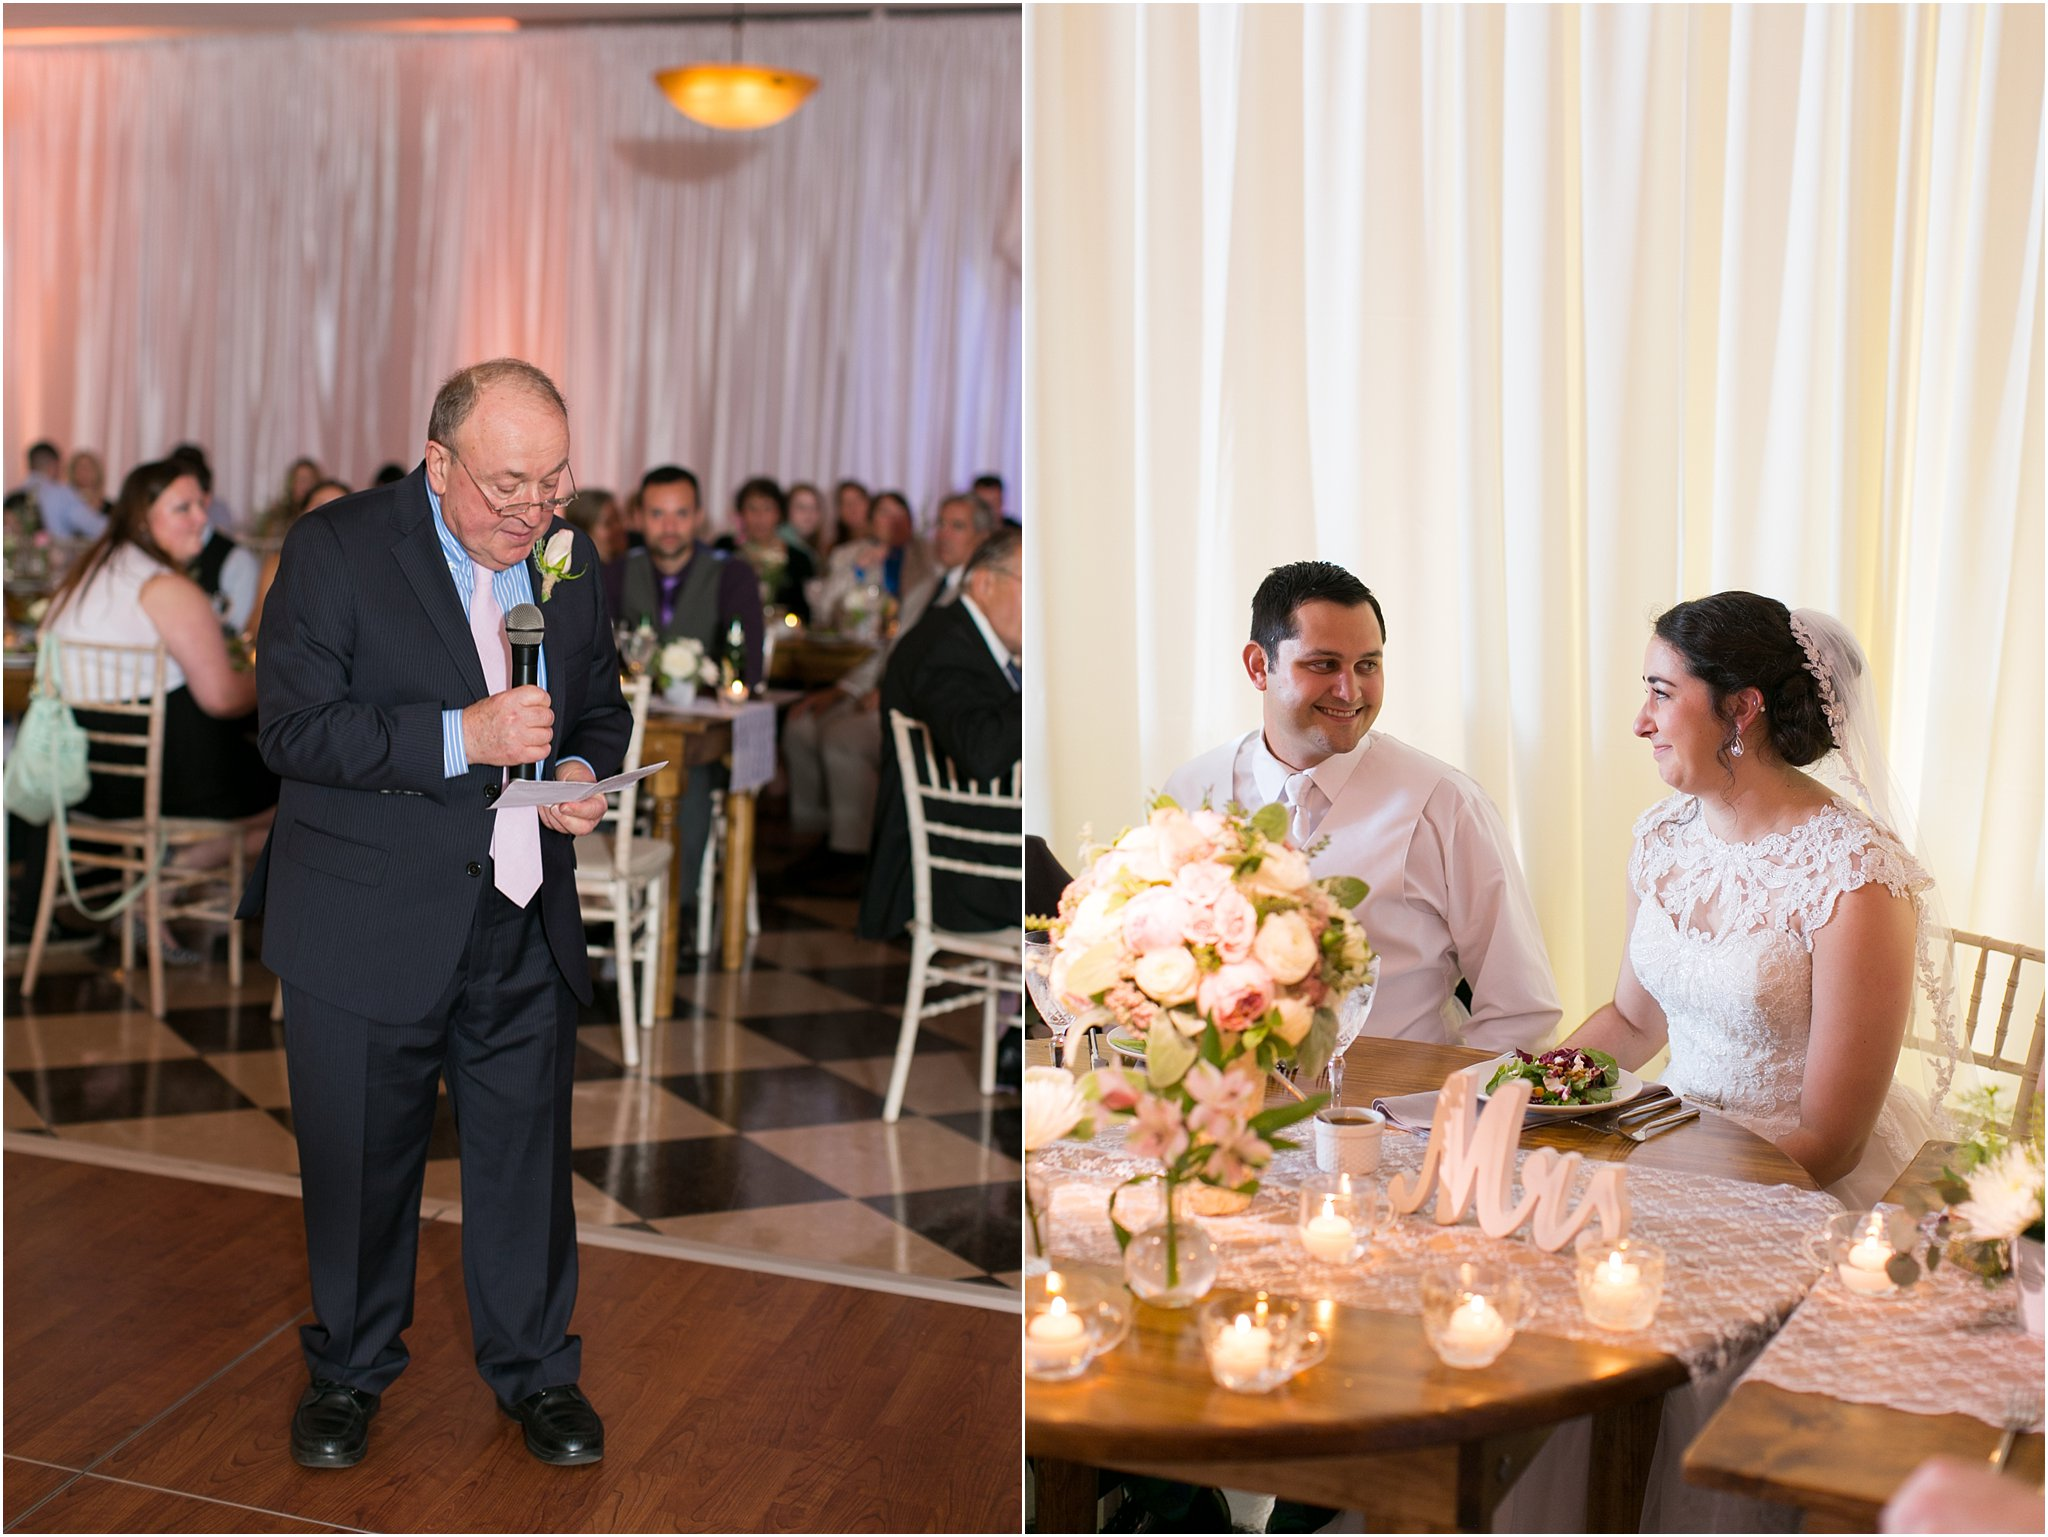 jessica_ryan_photography_virginia_wedding_photographer_wedding_hurricane_norfolk_botanical_gardens_hurricane_matthew_wedding_3634